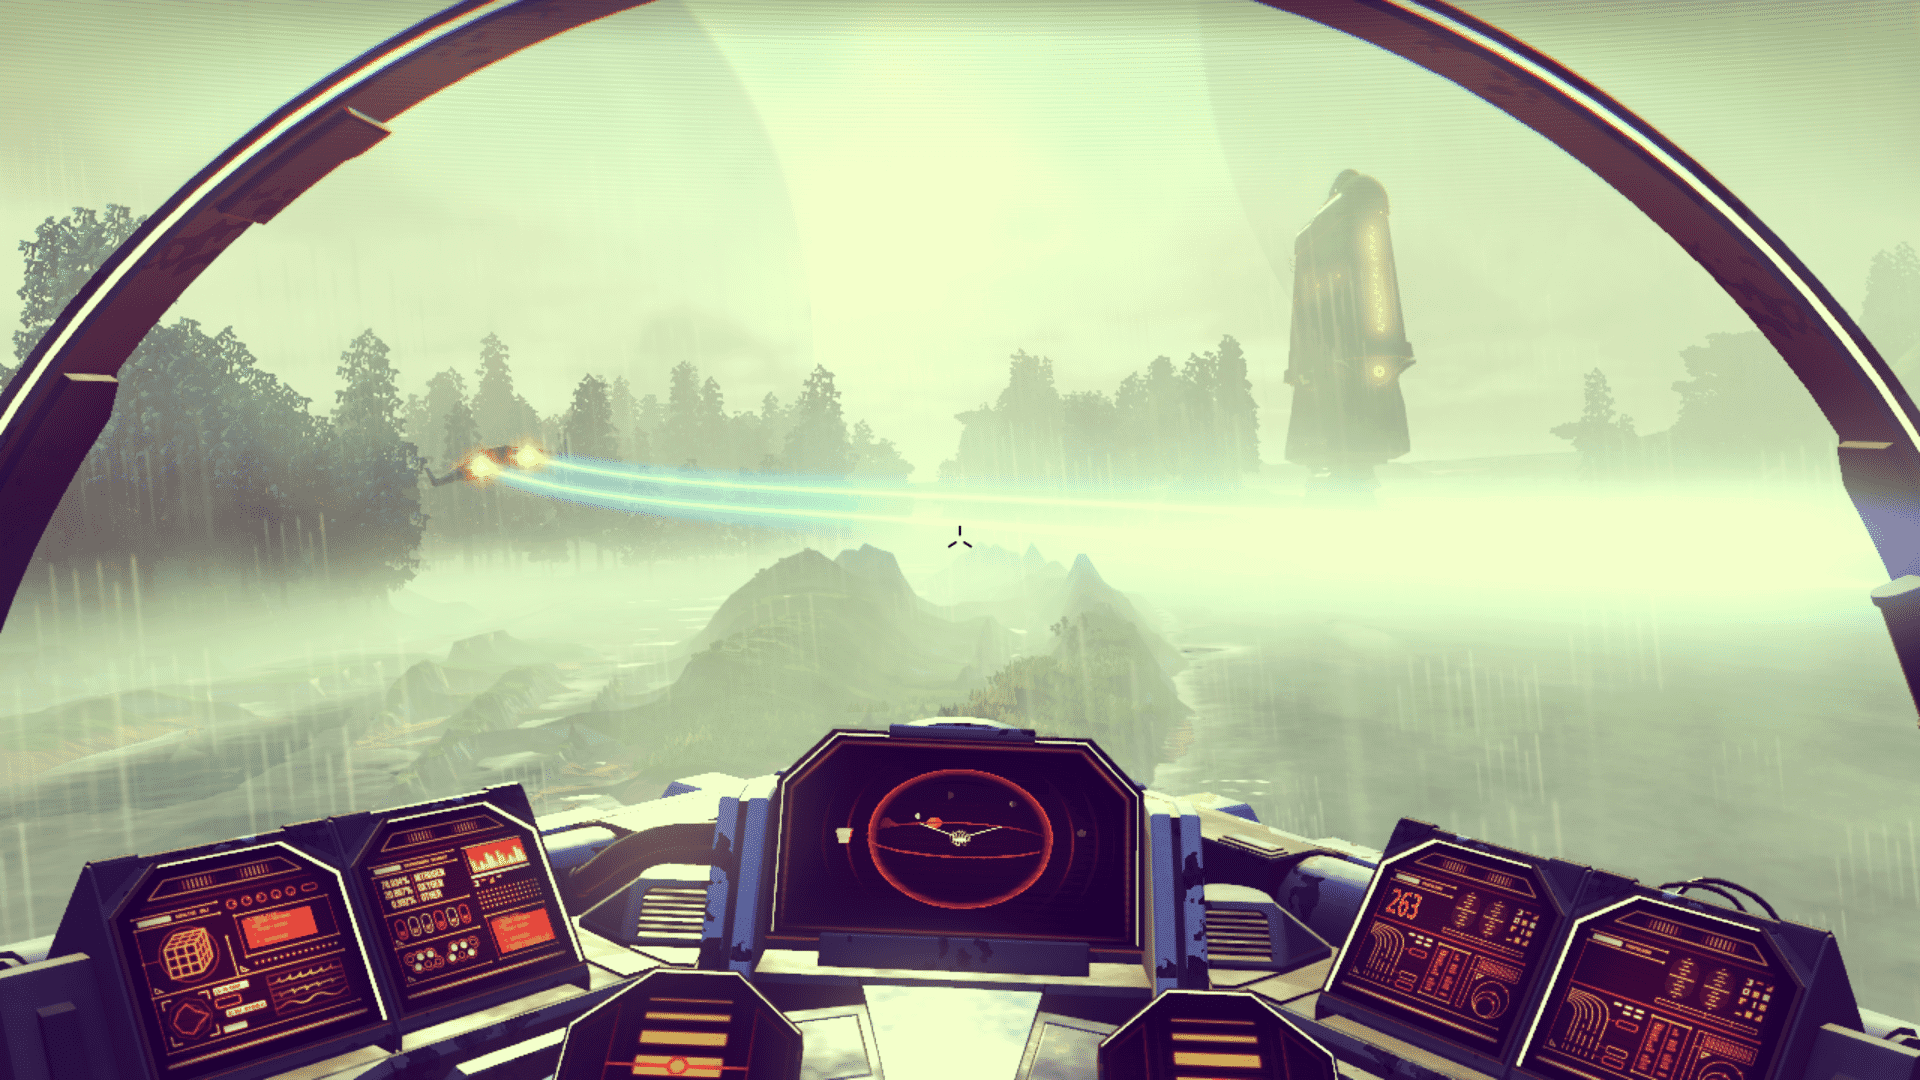 In a spacecraft cockpit